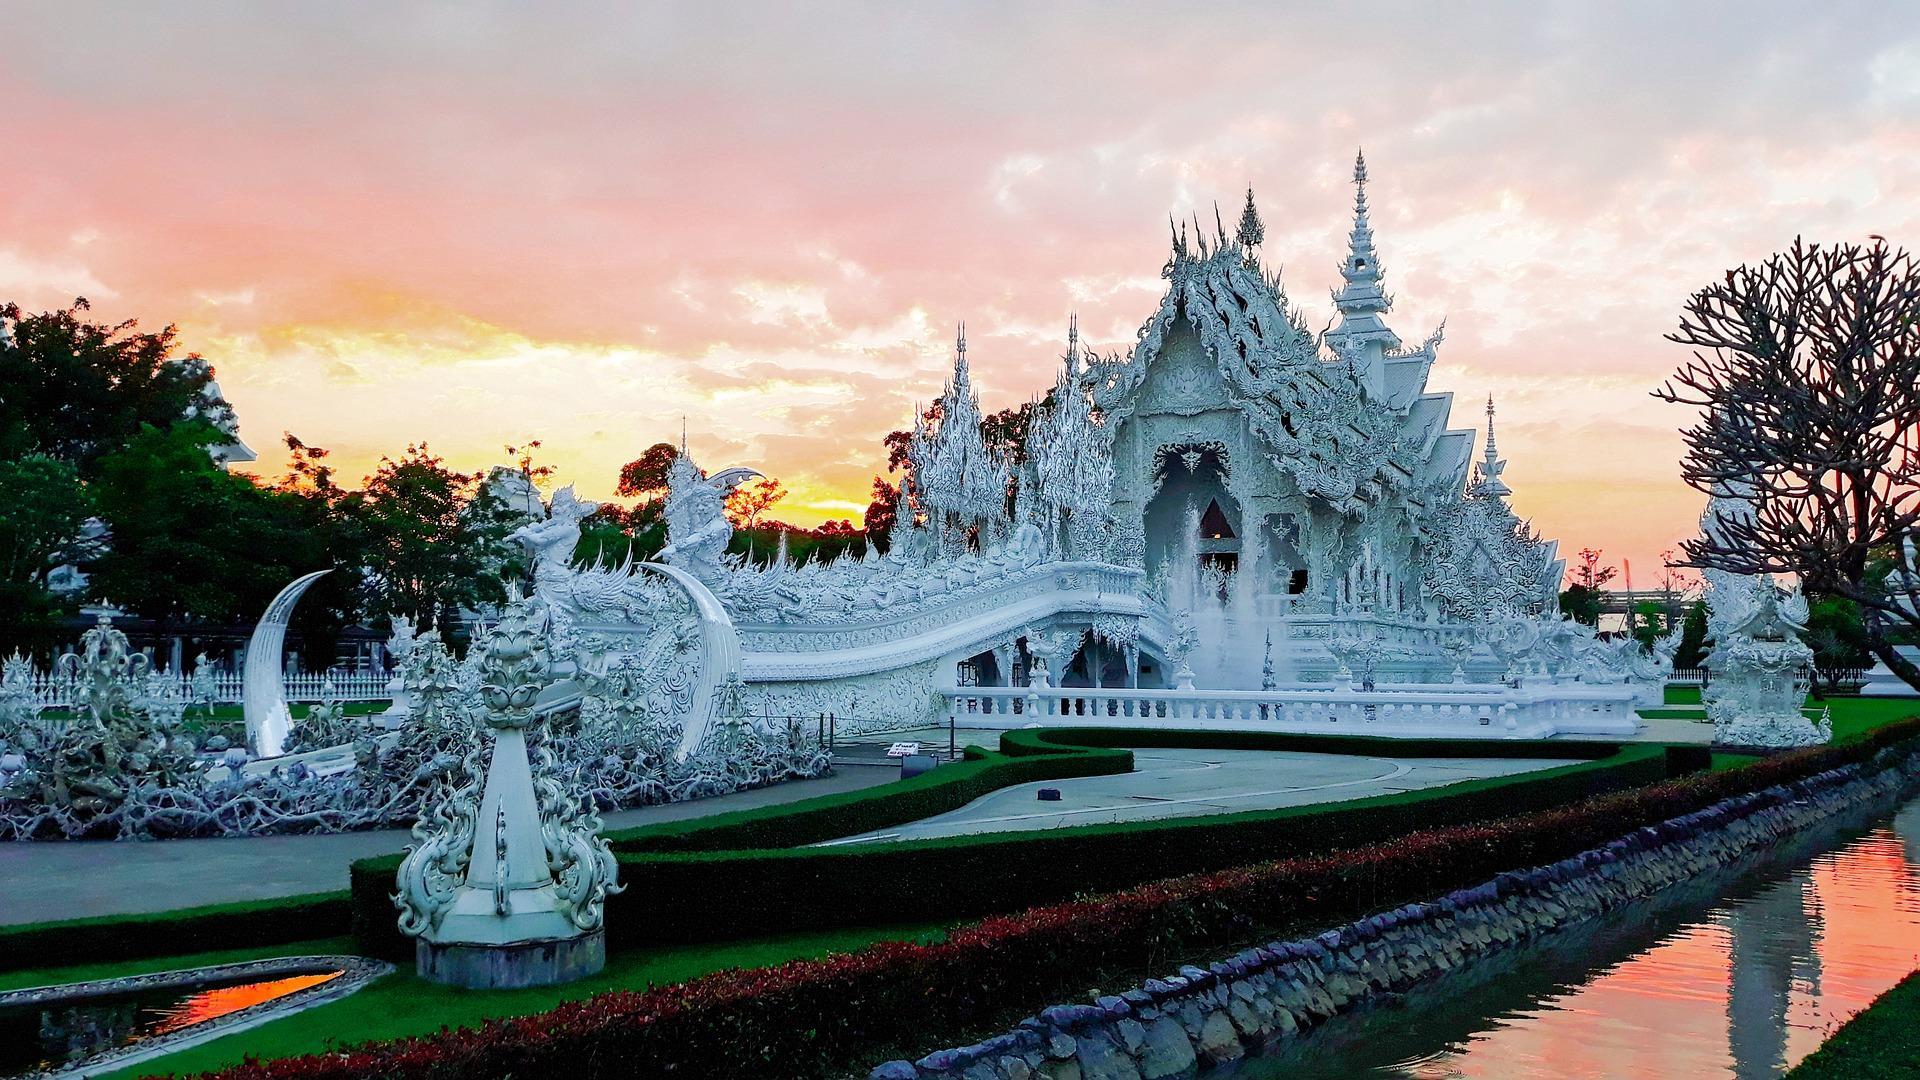 /optitravel/online/www/layout22/single_product.php?pkt_id=253&Produto=Tailândia Clássica & Krabi&destino=TAILÂNDIA